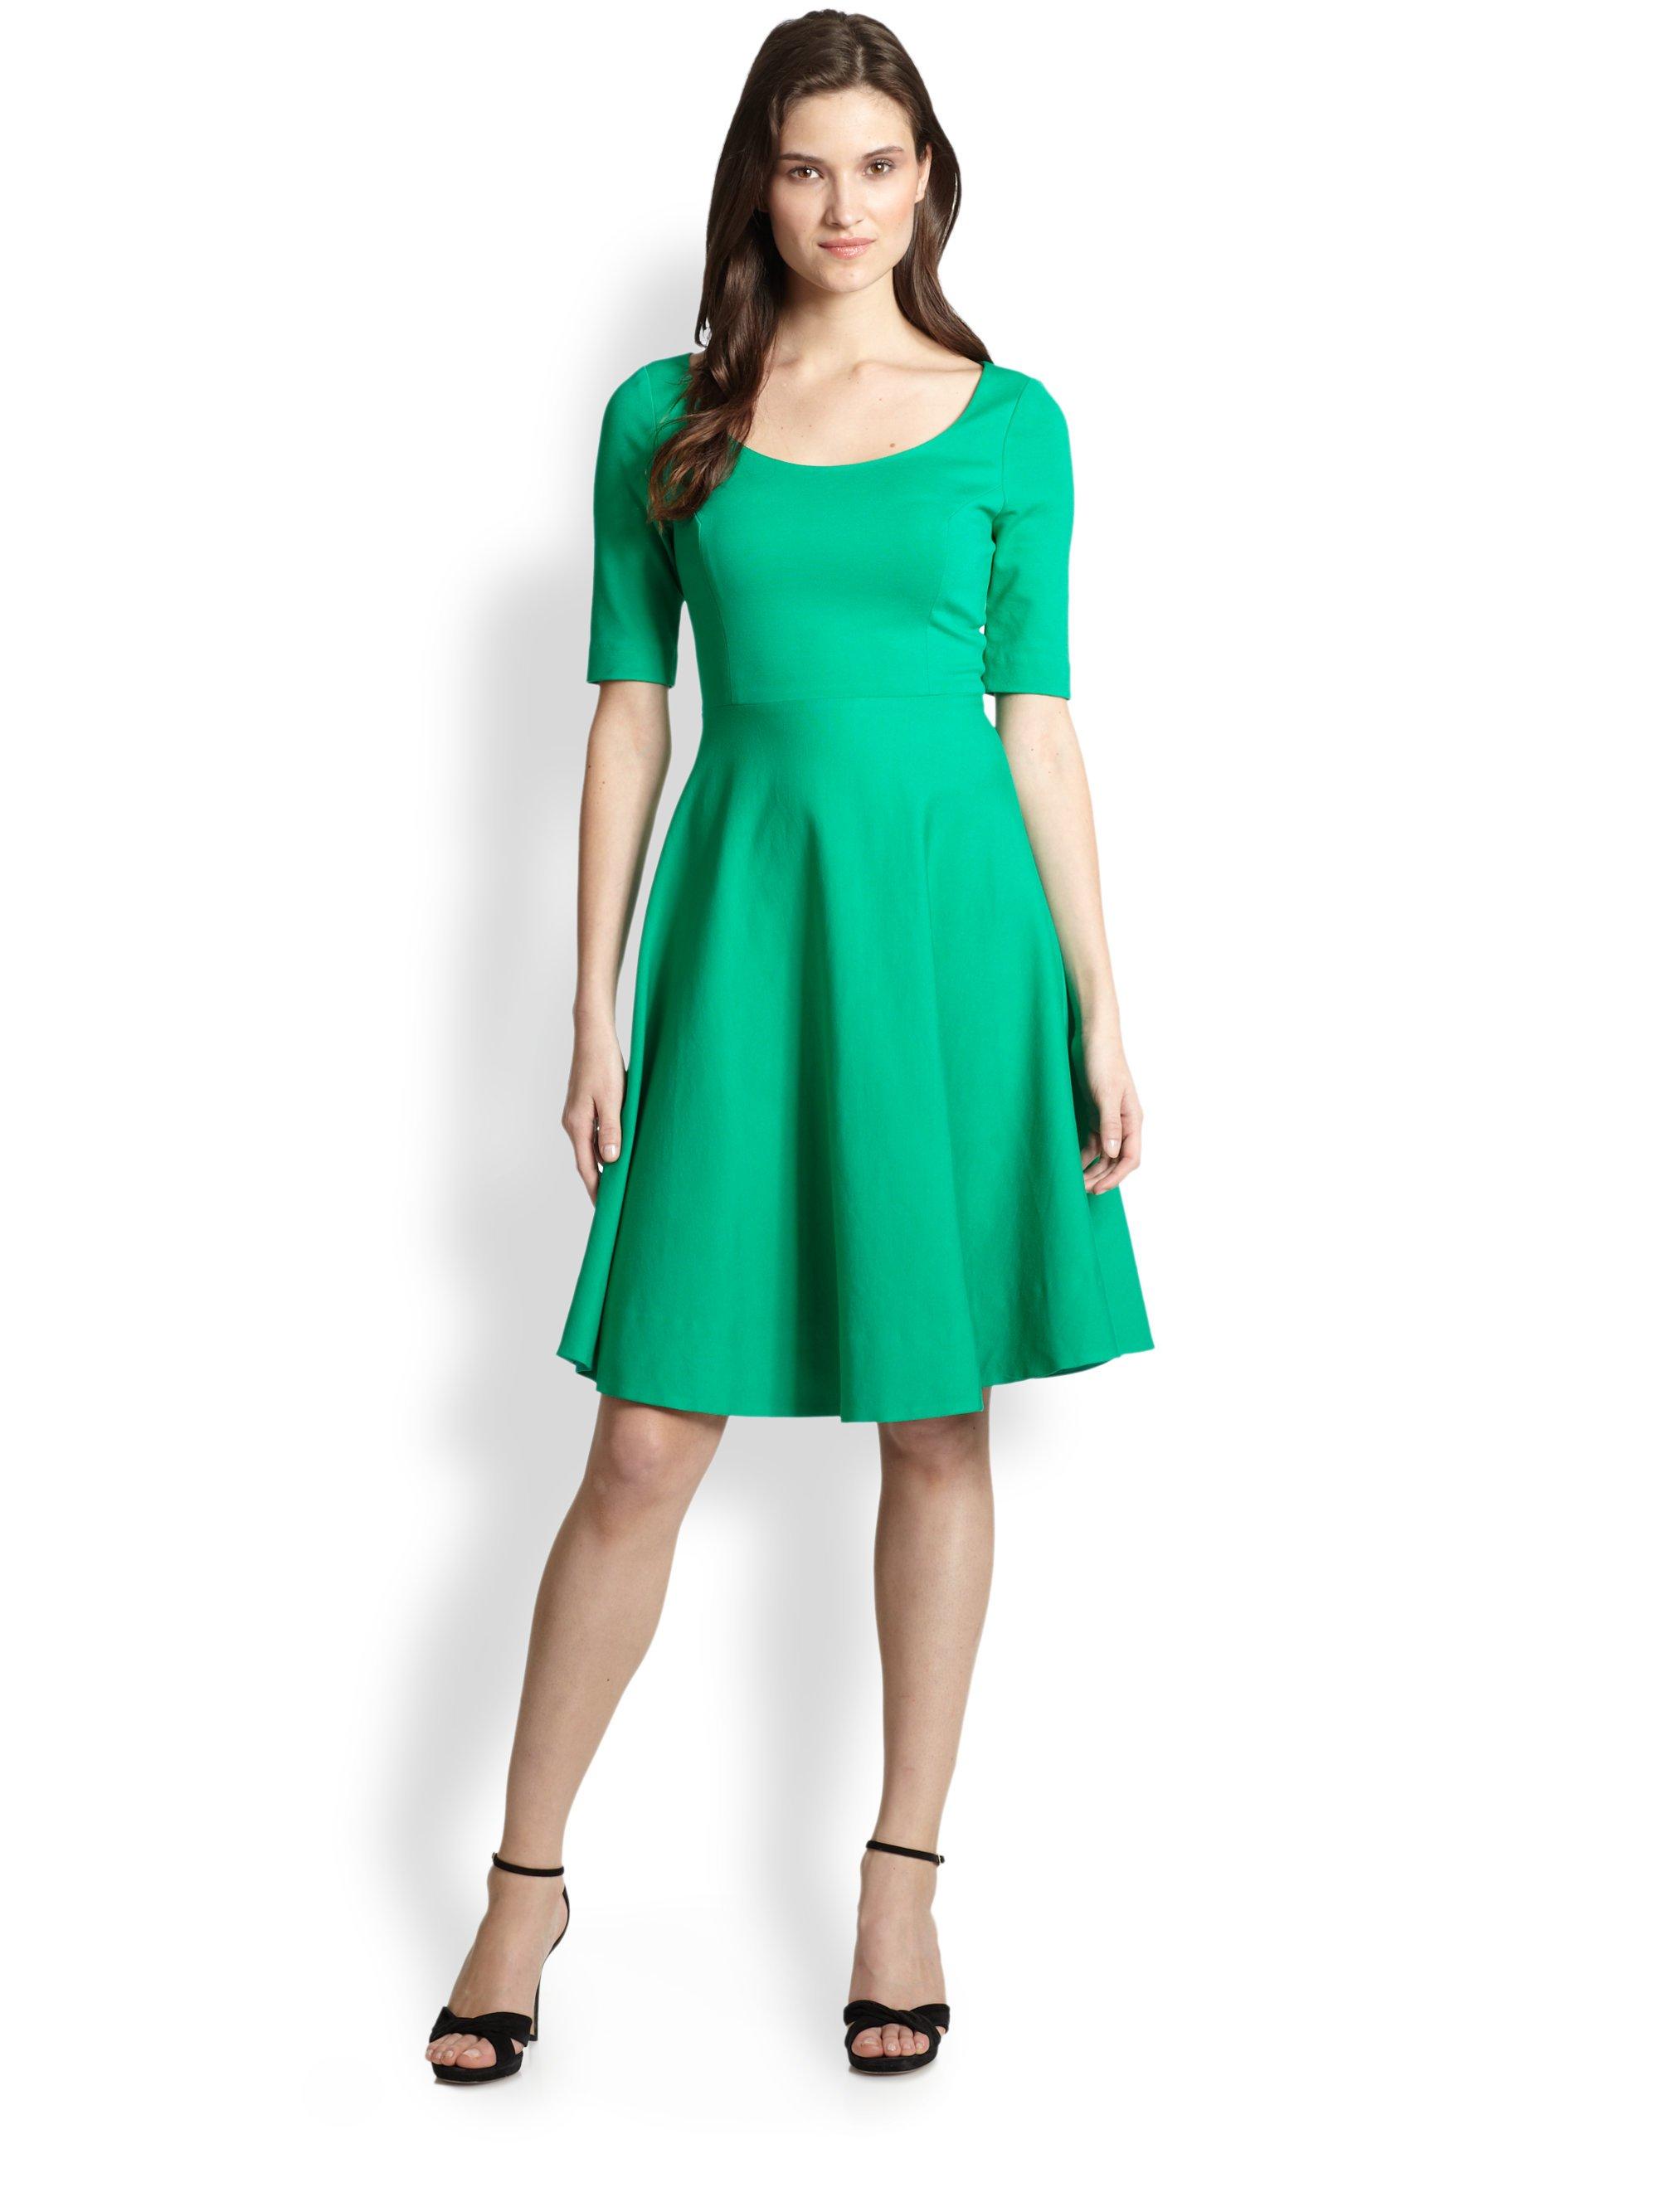 Lyst Kate Spade New York Jada Dress In Green